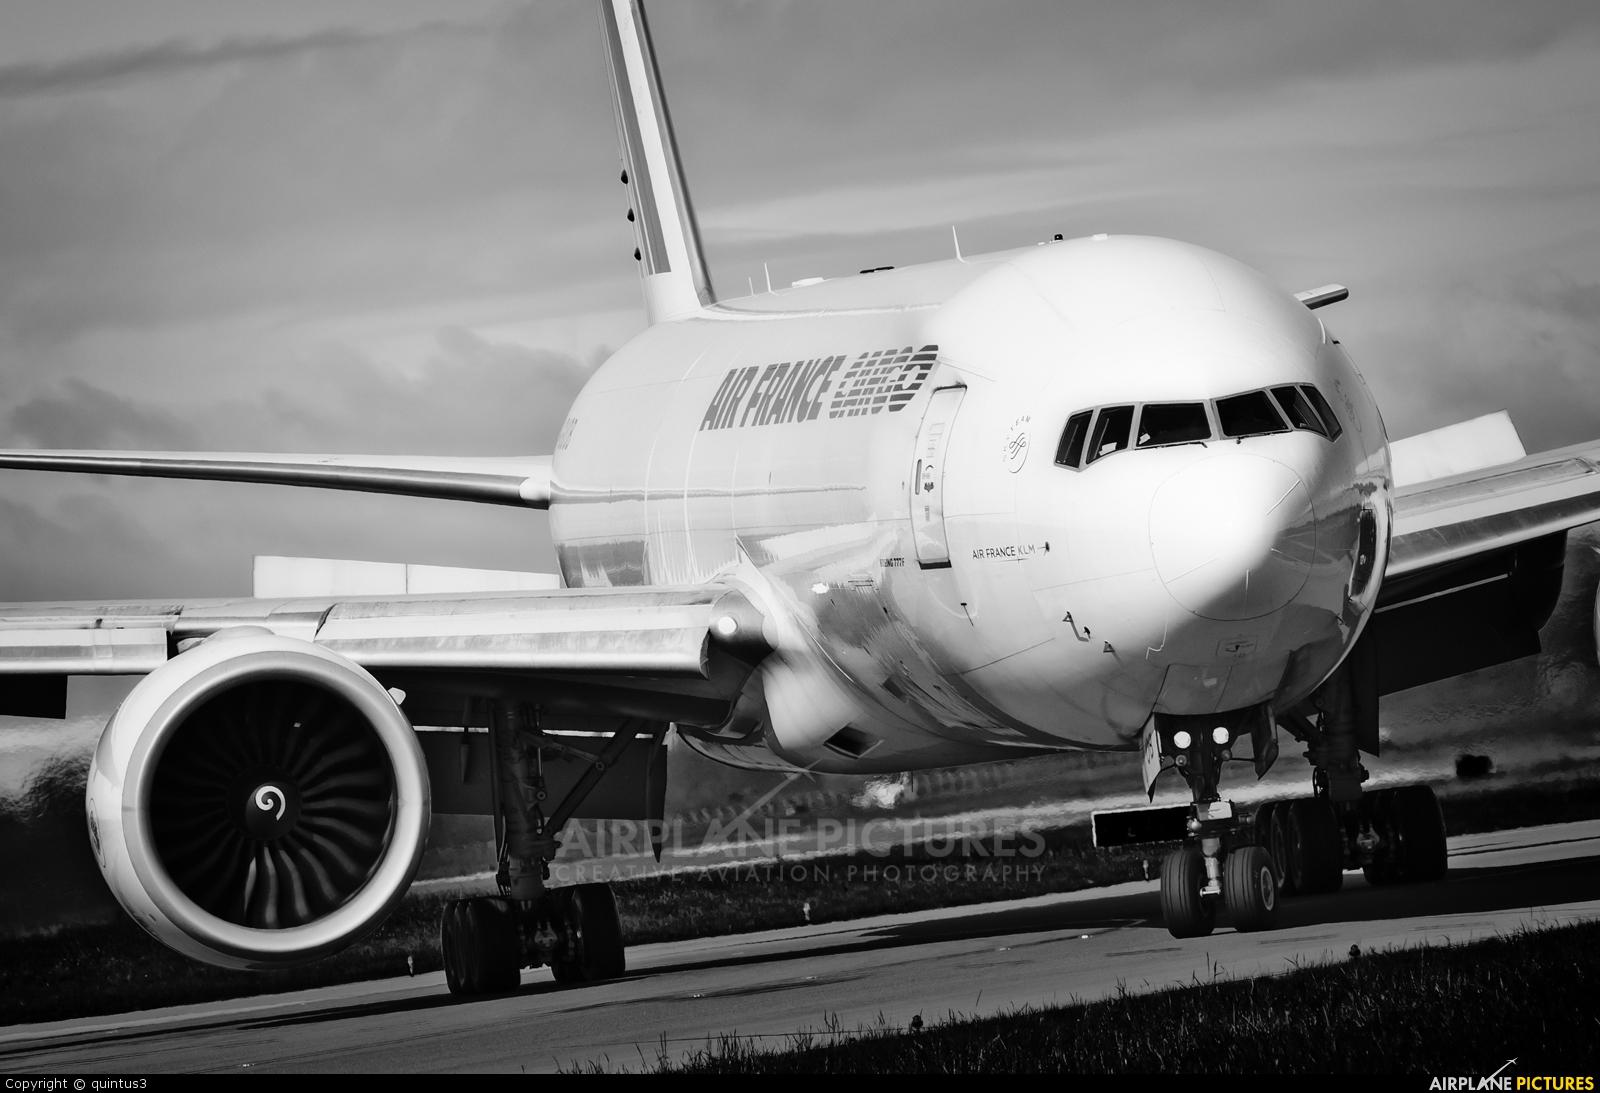 Air France Cargo F-GUOB aircraft at Dublin